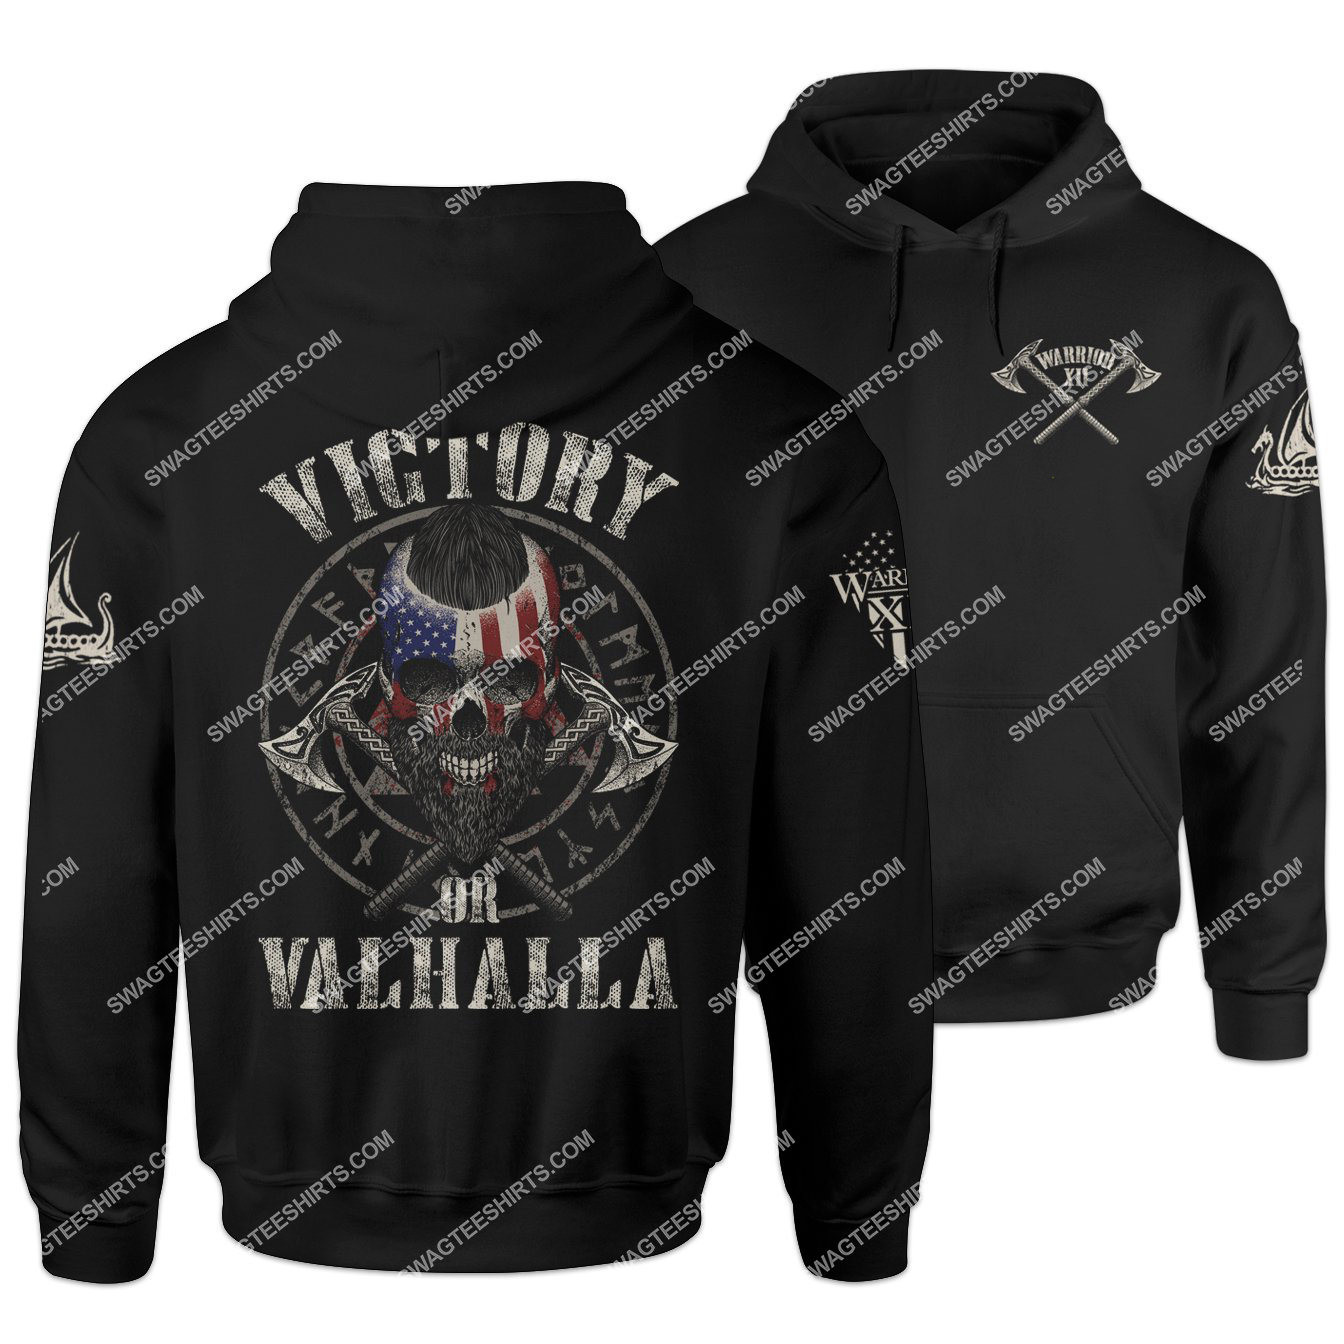 victory or valhalla viking skull american flag shirt 1 - Copy (3)